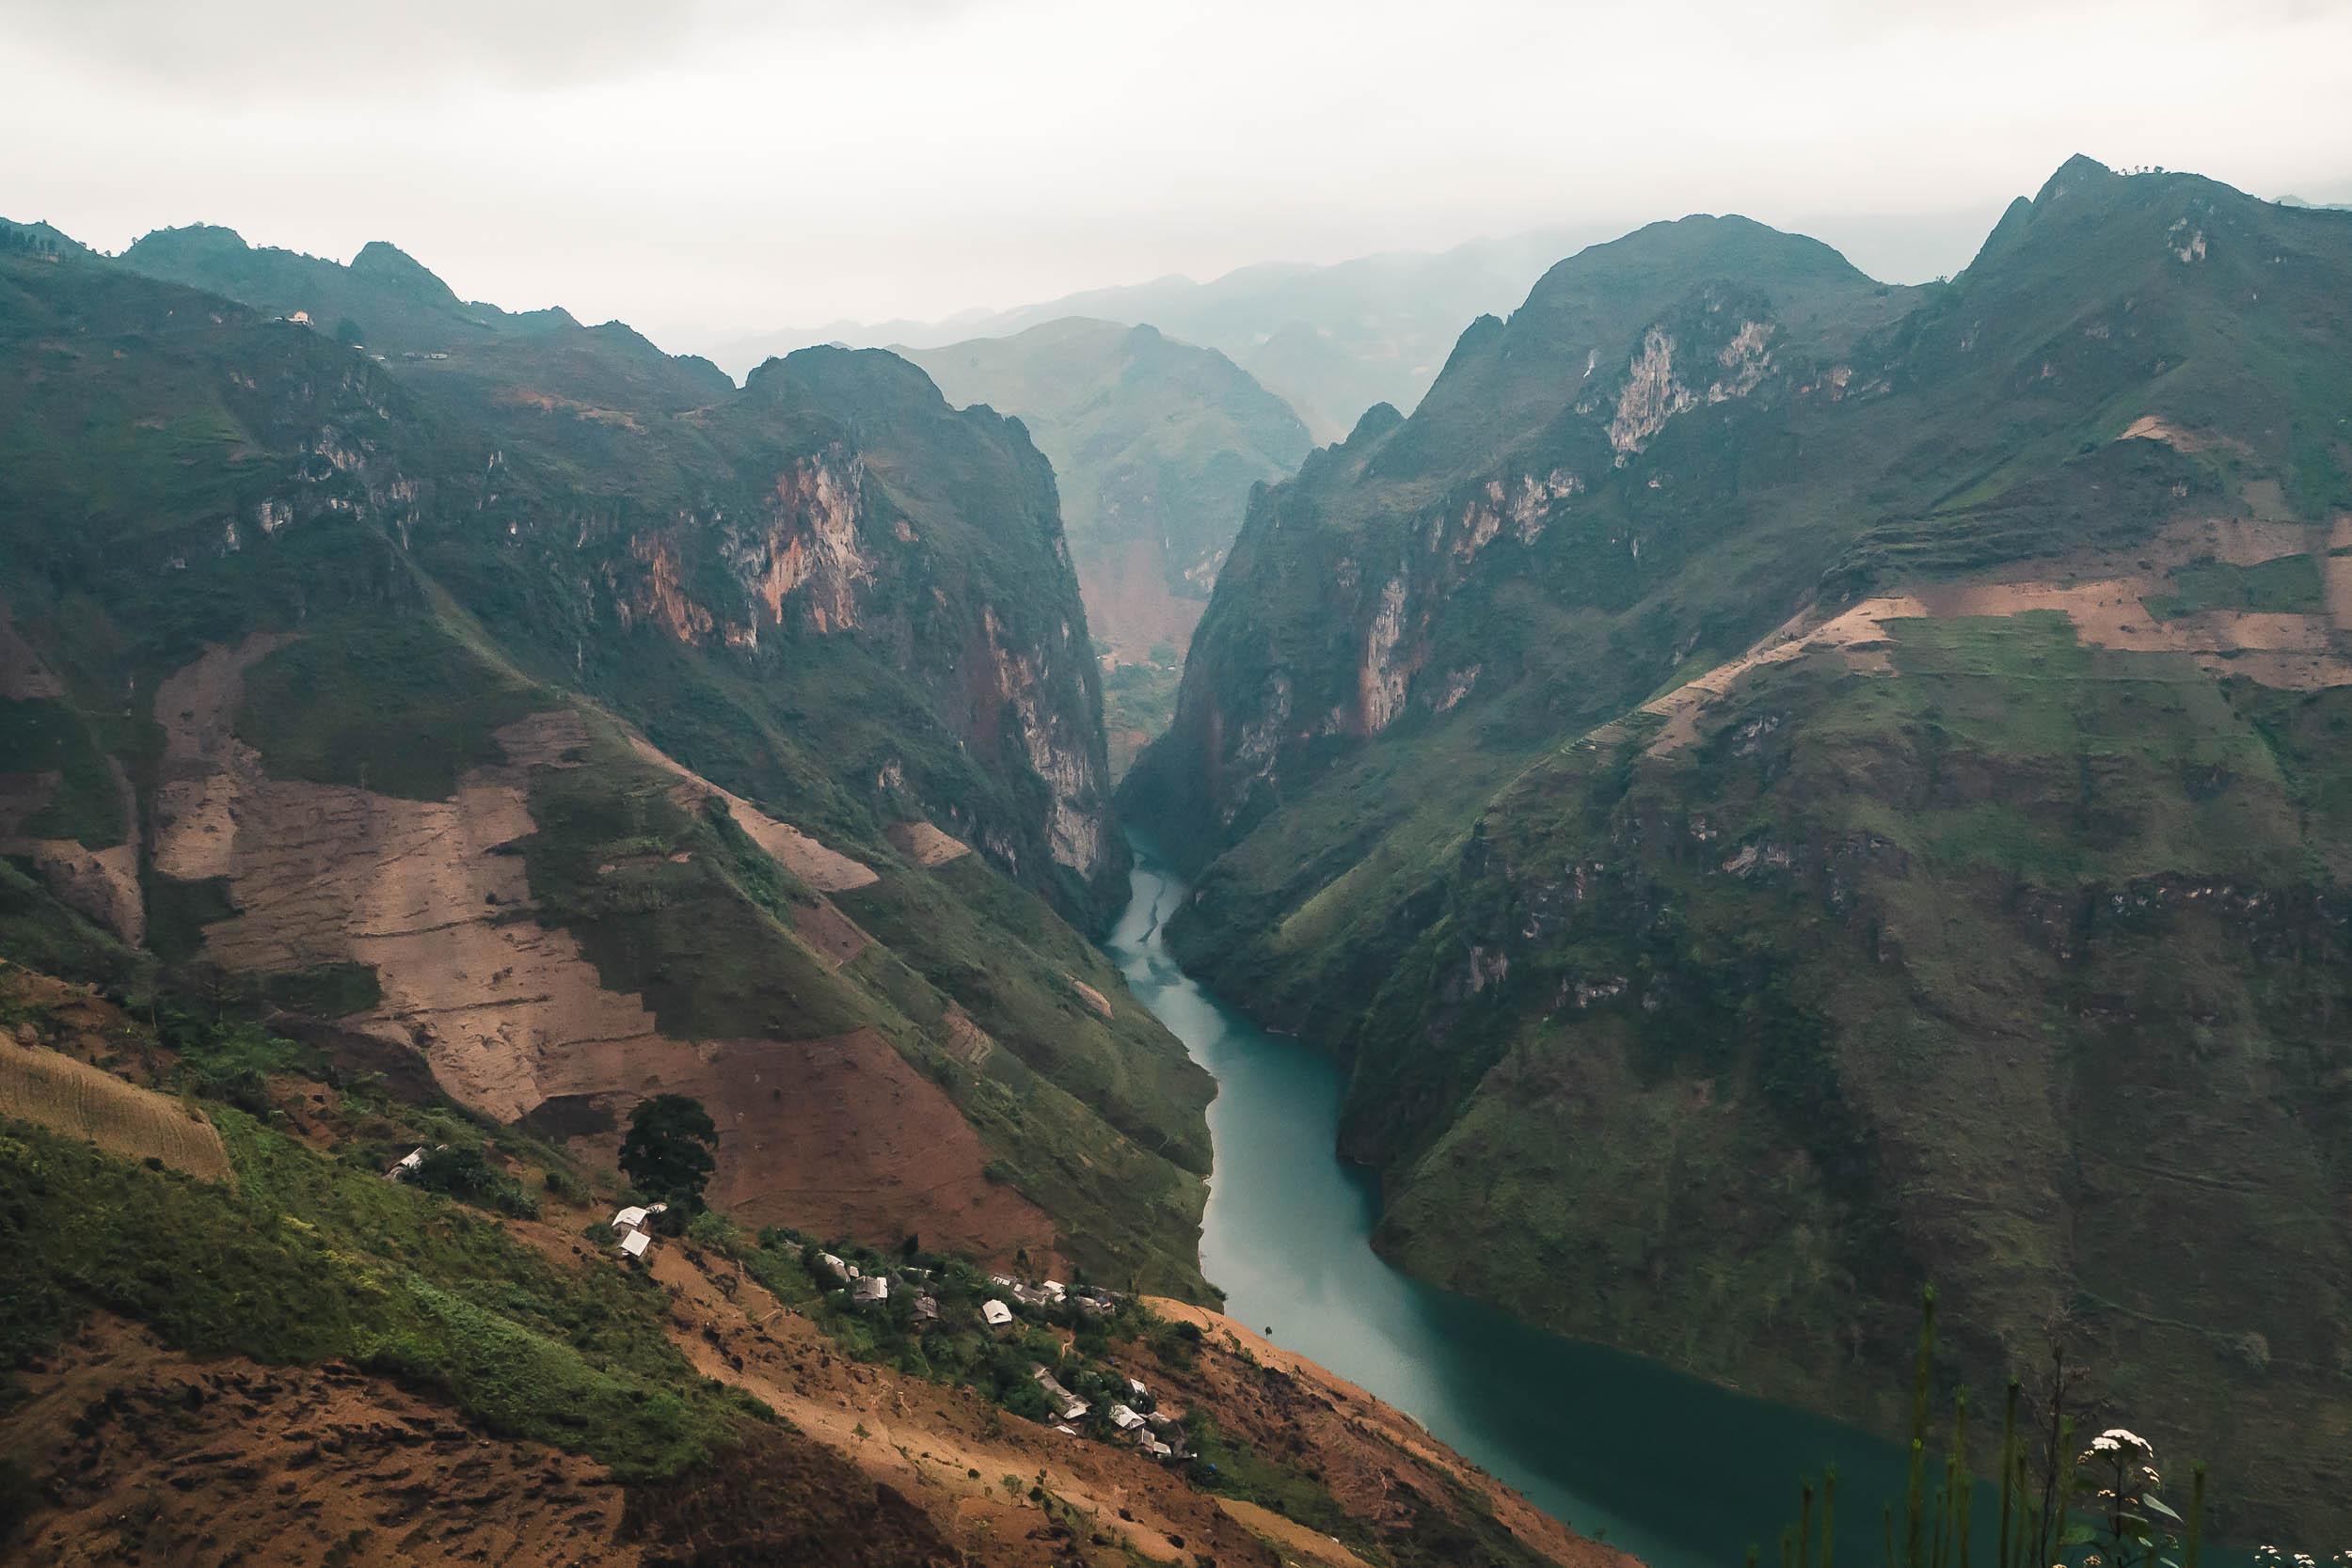 ha_giang_river.jpg